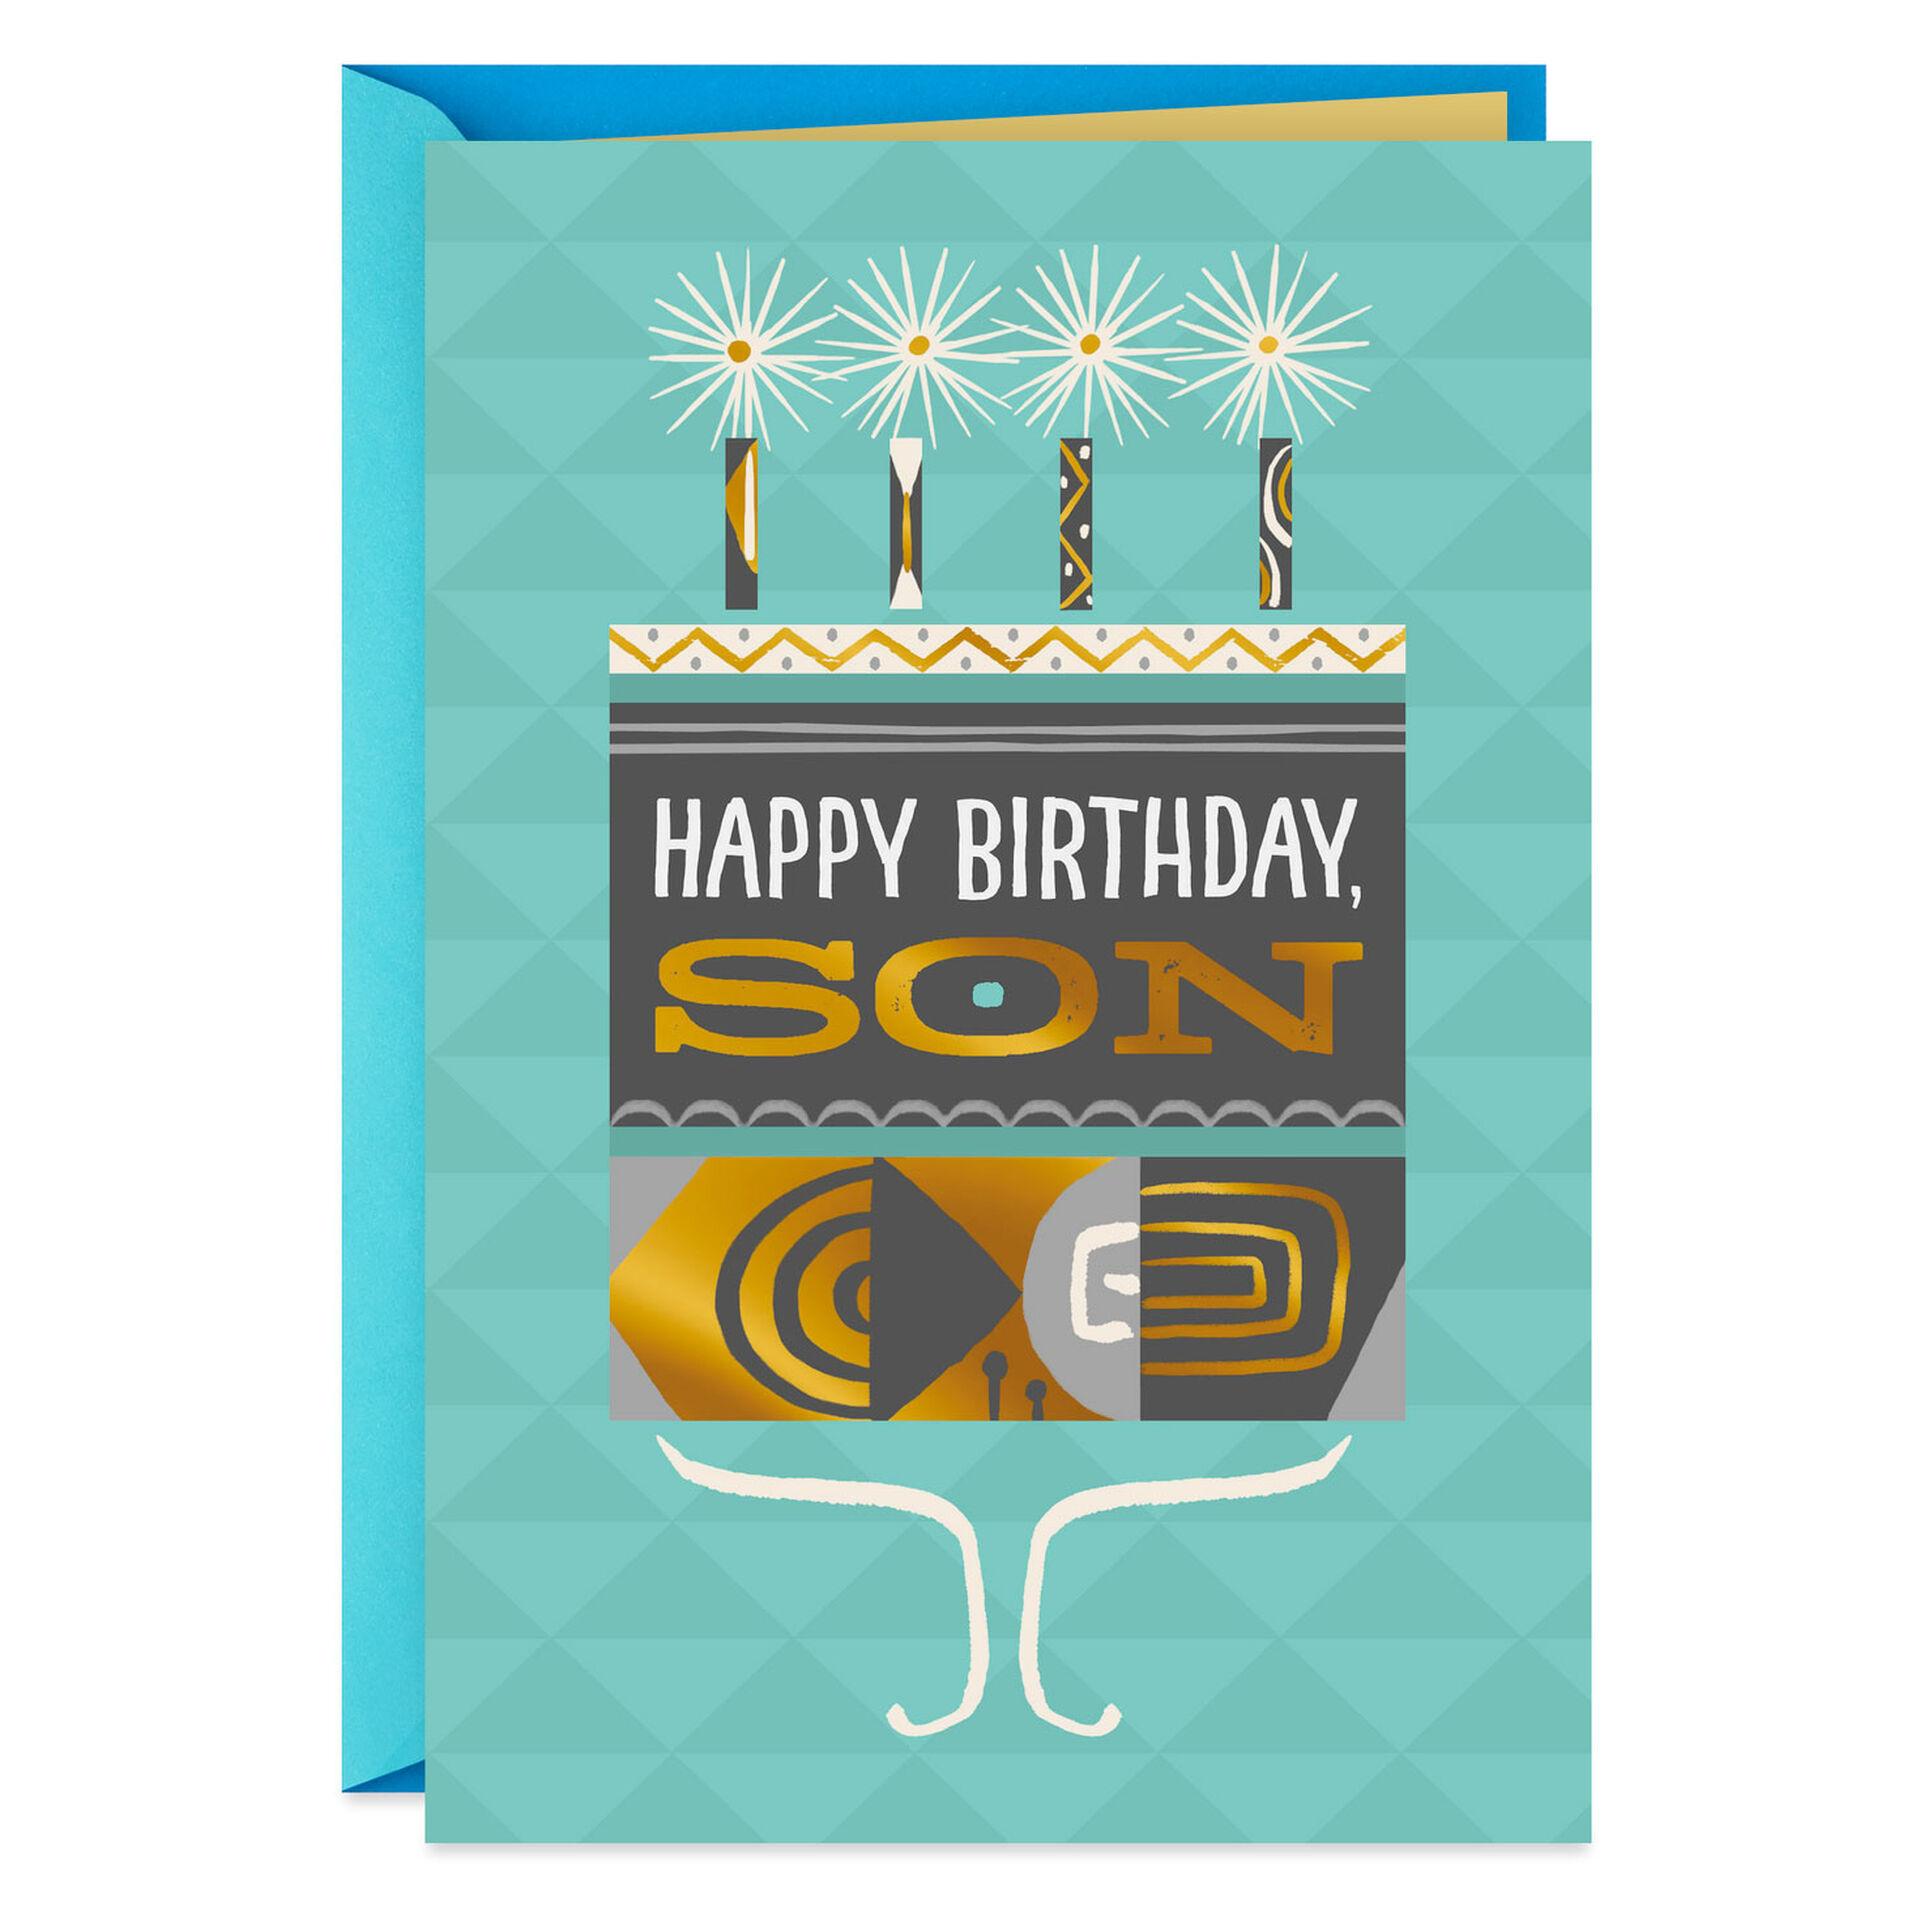 New Hallmark Happy Birthday To Son In Law Greeting Card